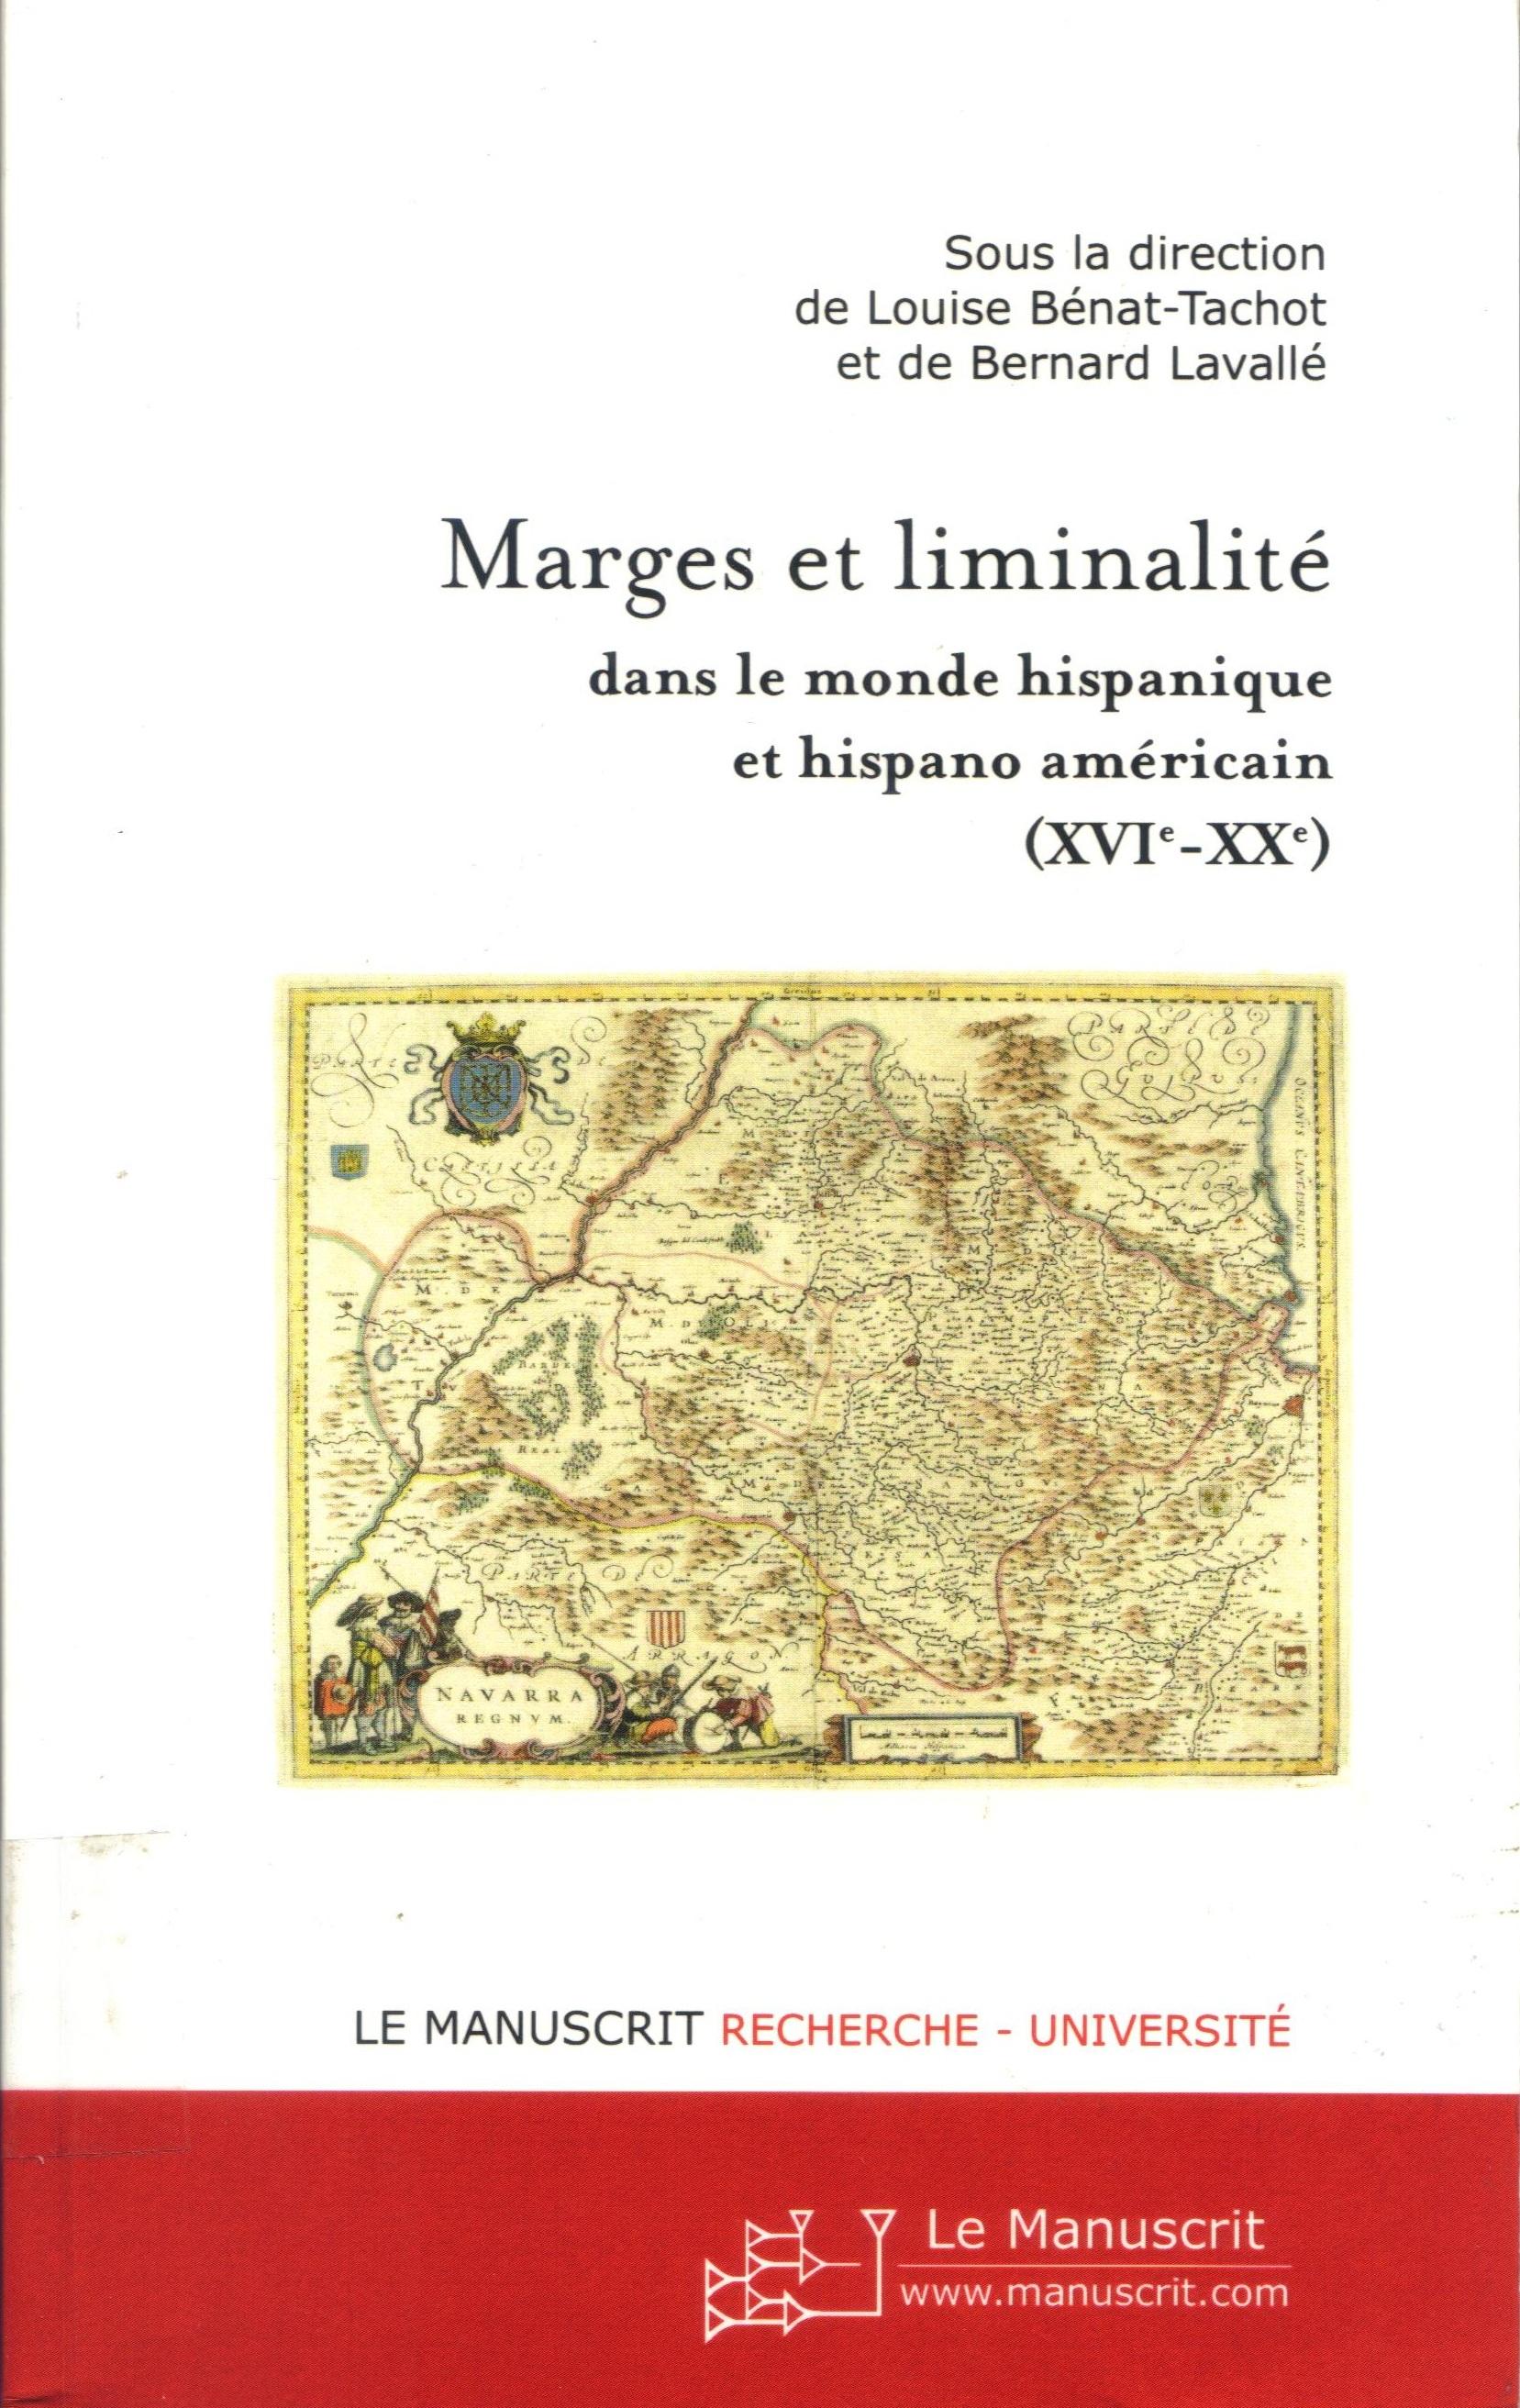 CRAEC PUBLICATIONS 2011 MARGES PORTADA